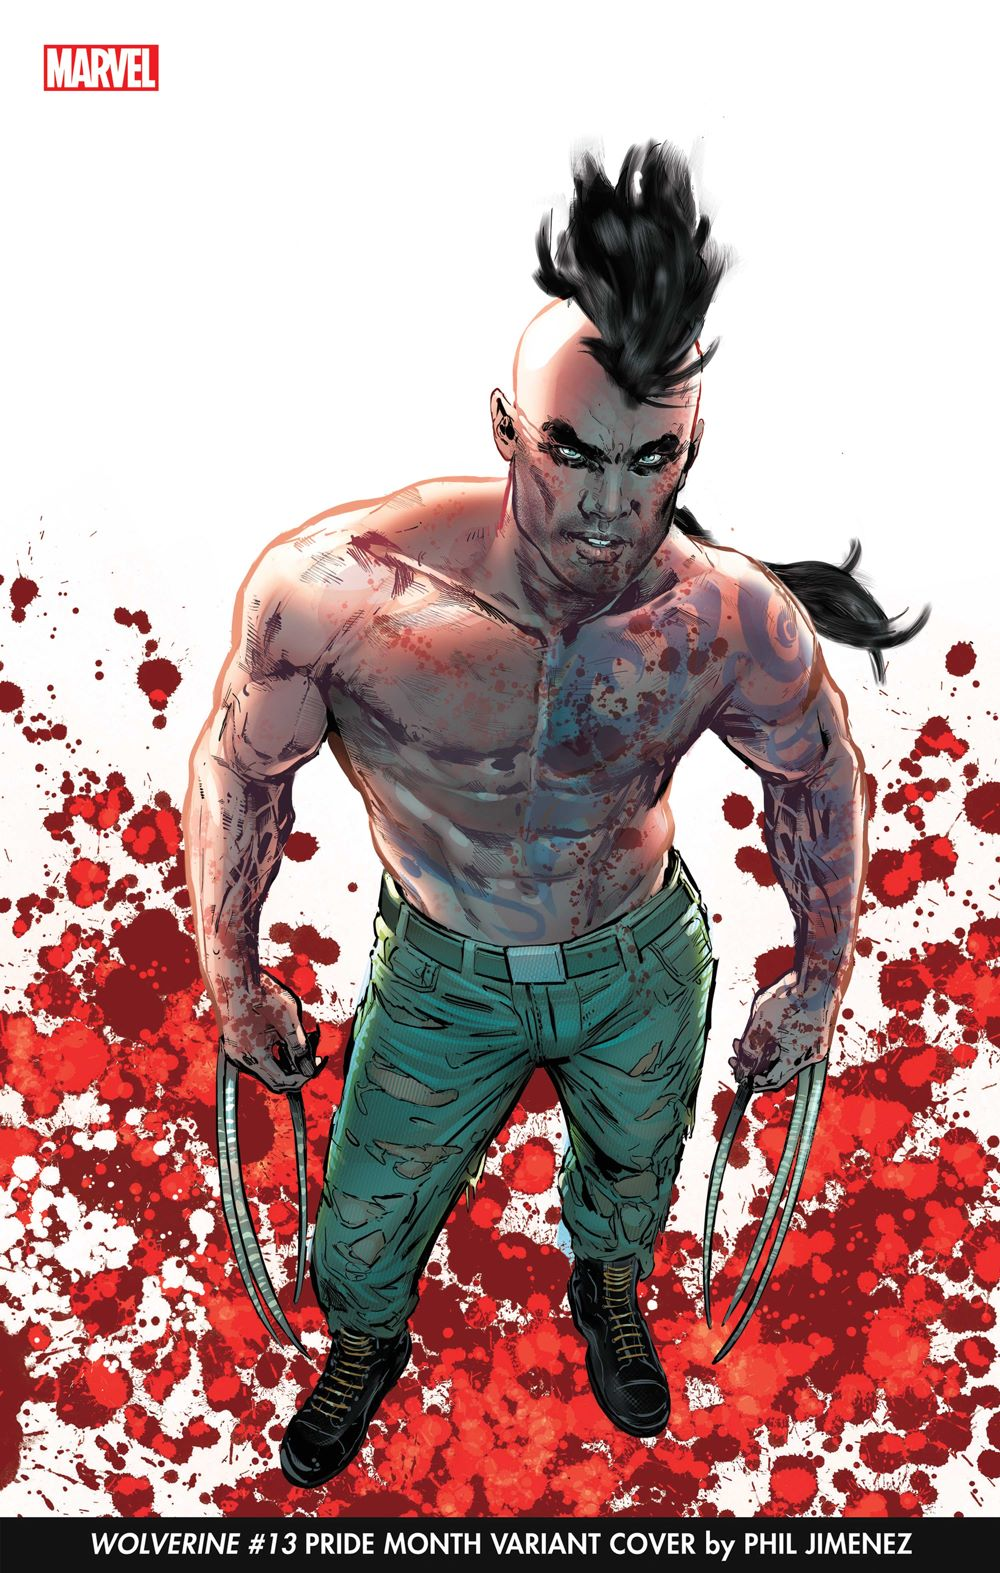 WOLVERINE_13_PrideVar Phil Jimenez will provide covers for Marvel's Pride Month celebration